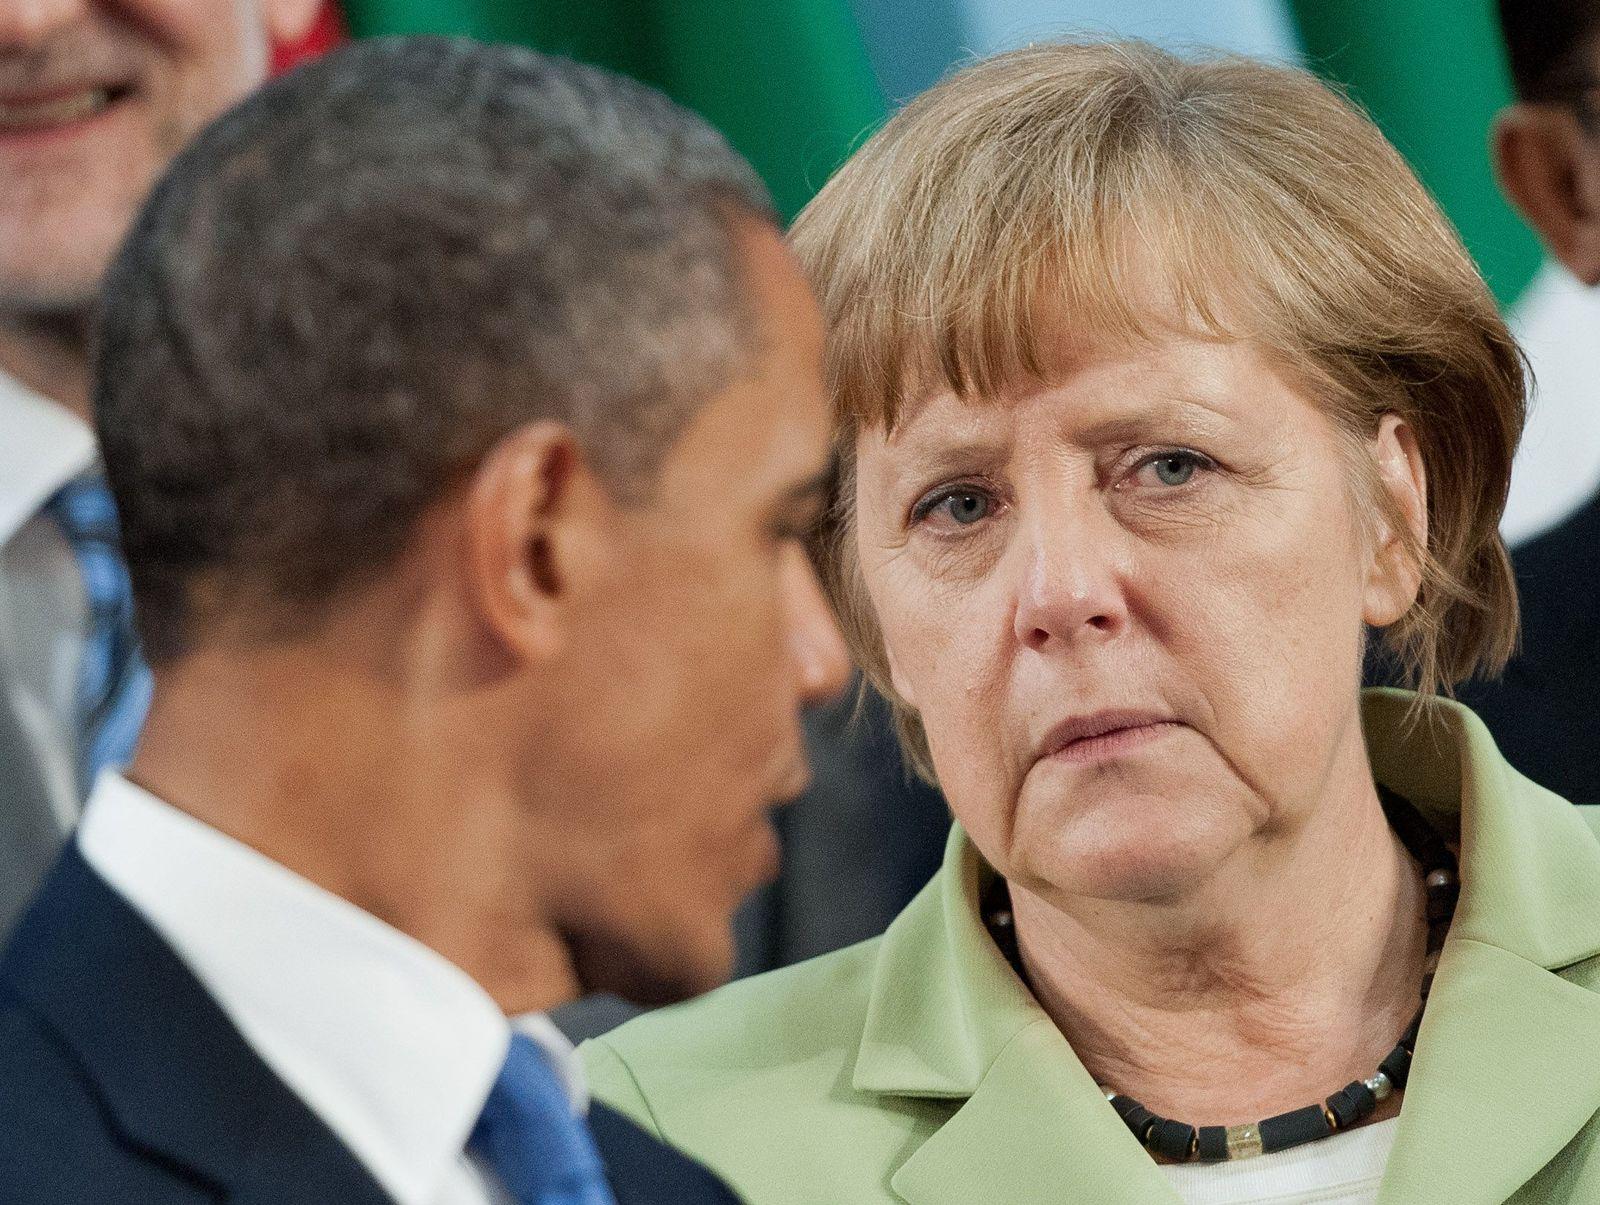 Merkel / Obama